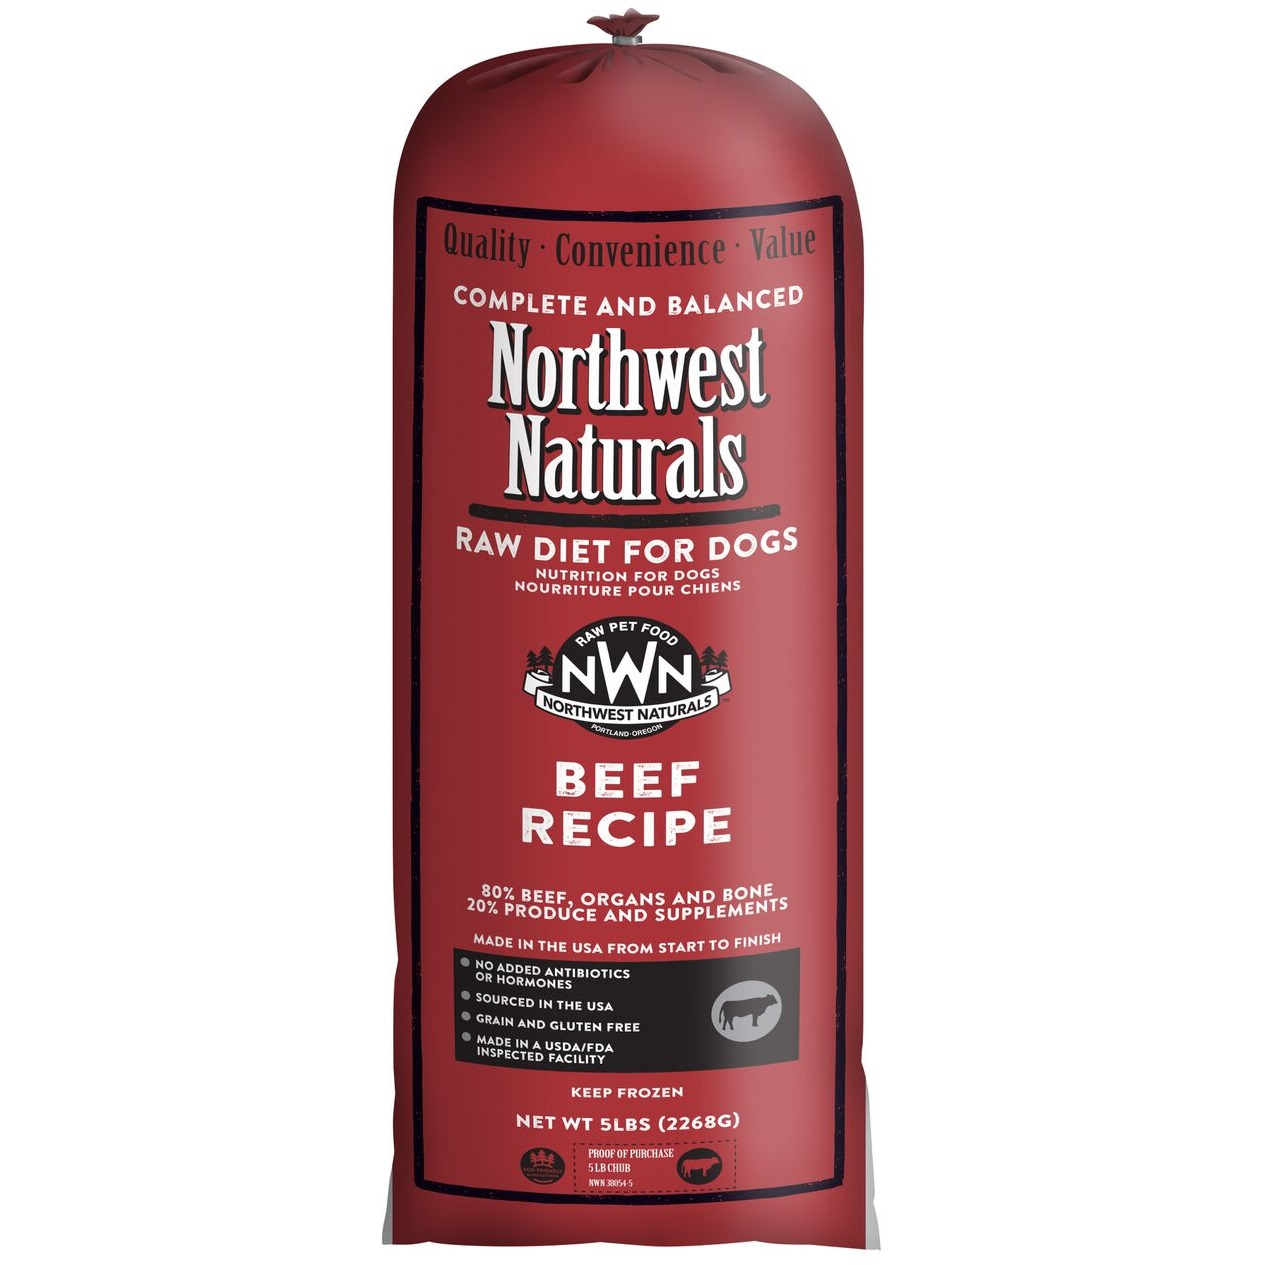 Northwest Naturals Raw Diet Grain-Free Beef Chub Roll Raw Frozen Dog Food, 5-lb